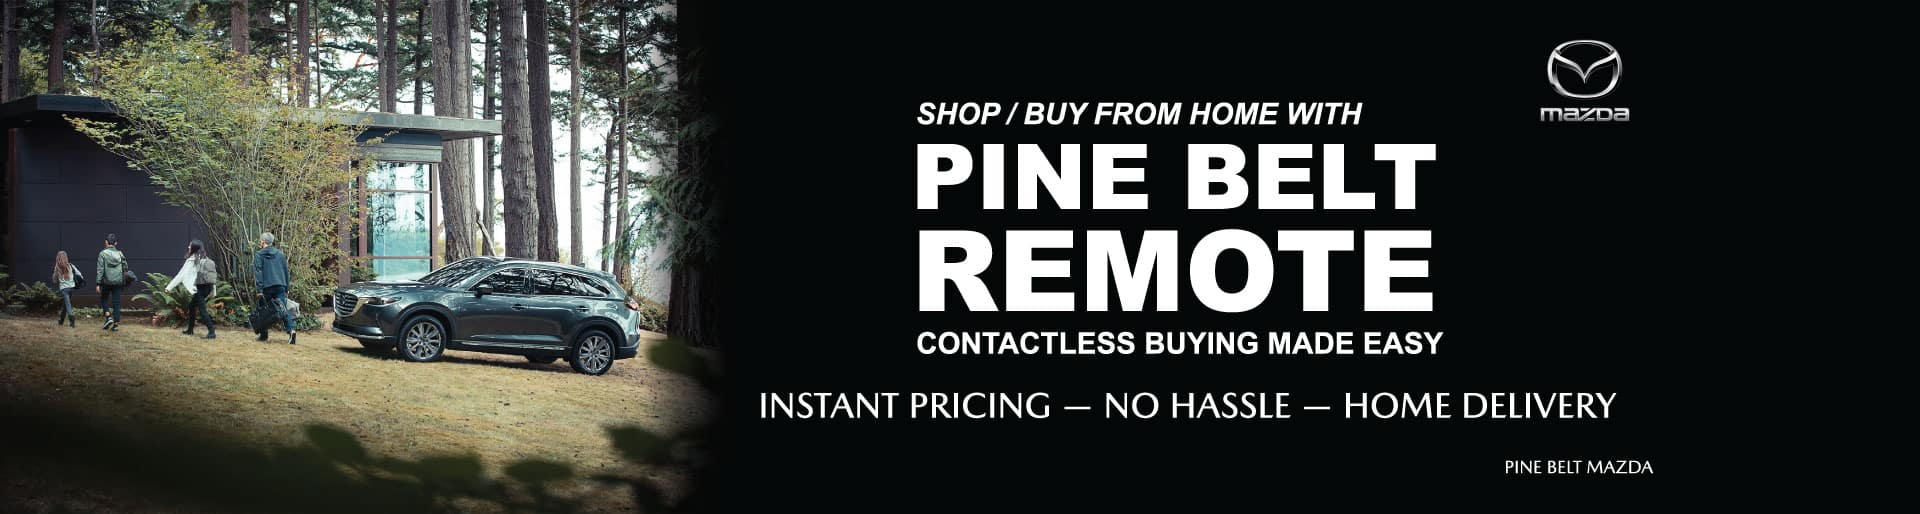 PBM-145-Pine-Belt-Remote-Slider_1920x514